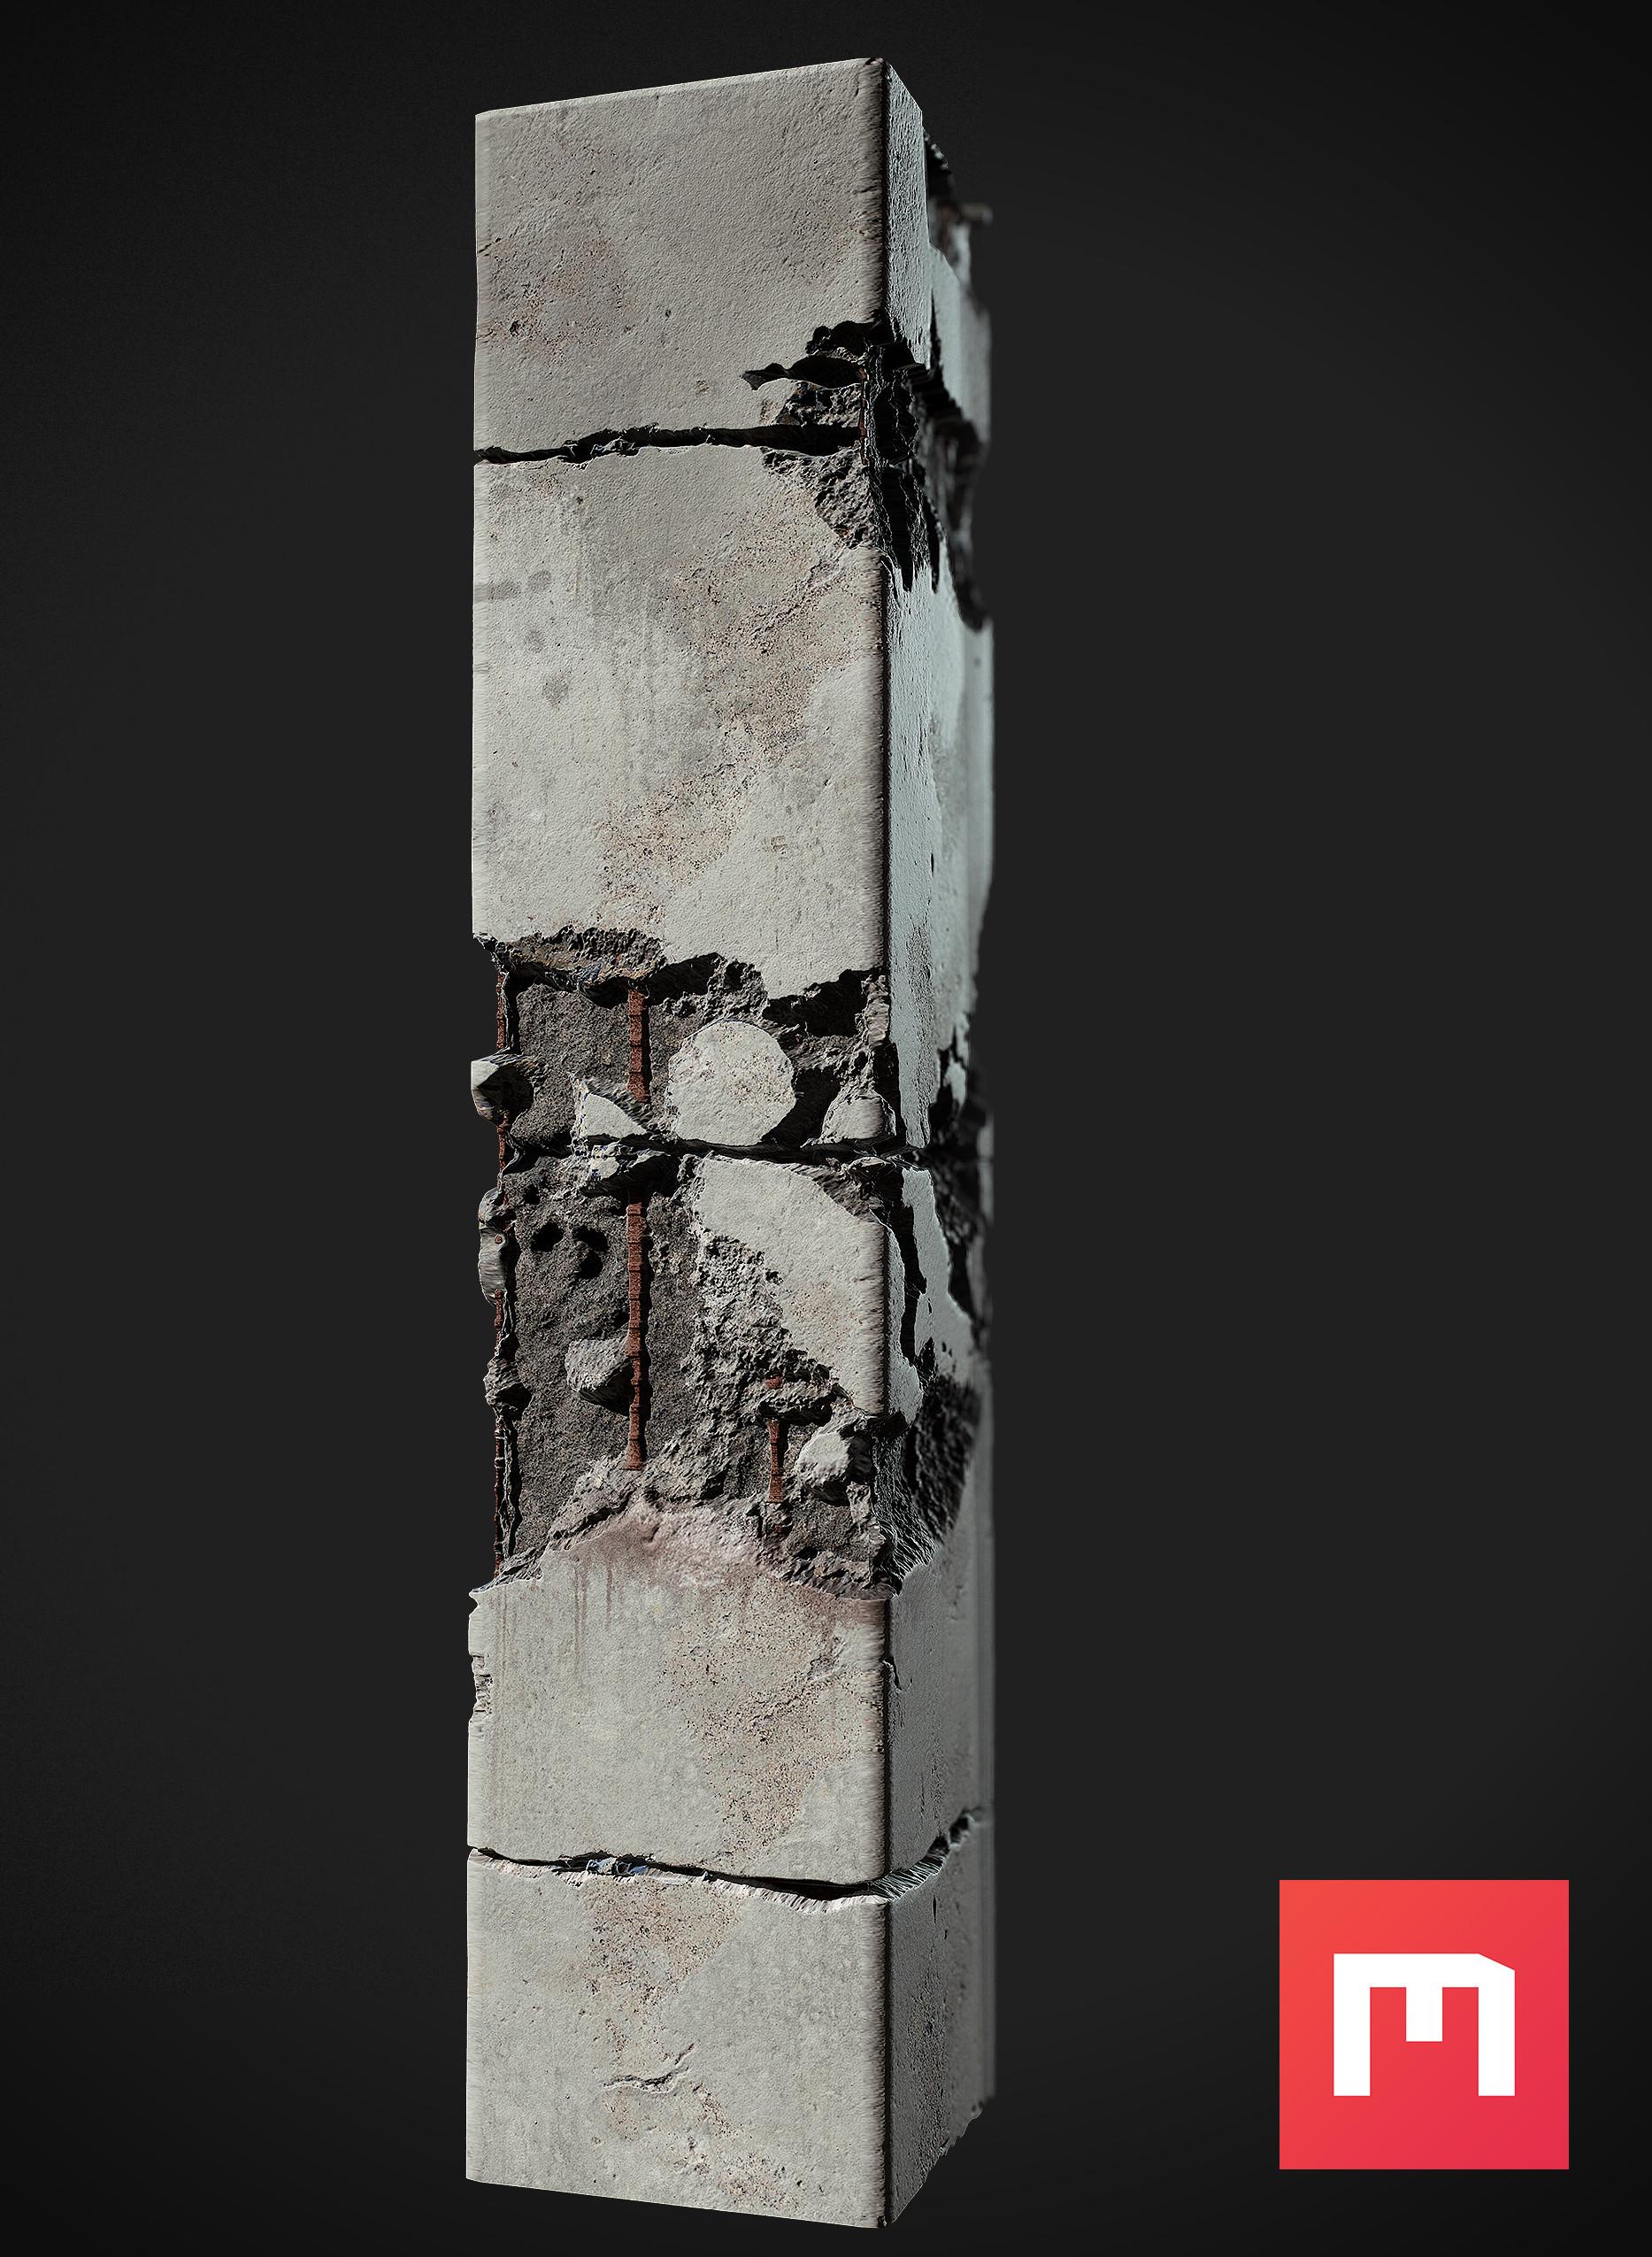 Wiktor ohman concrete pillar